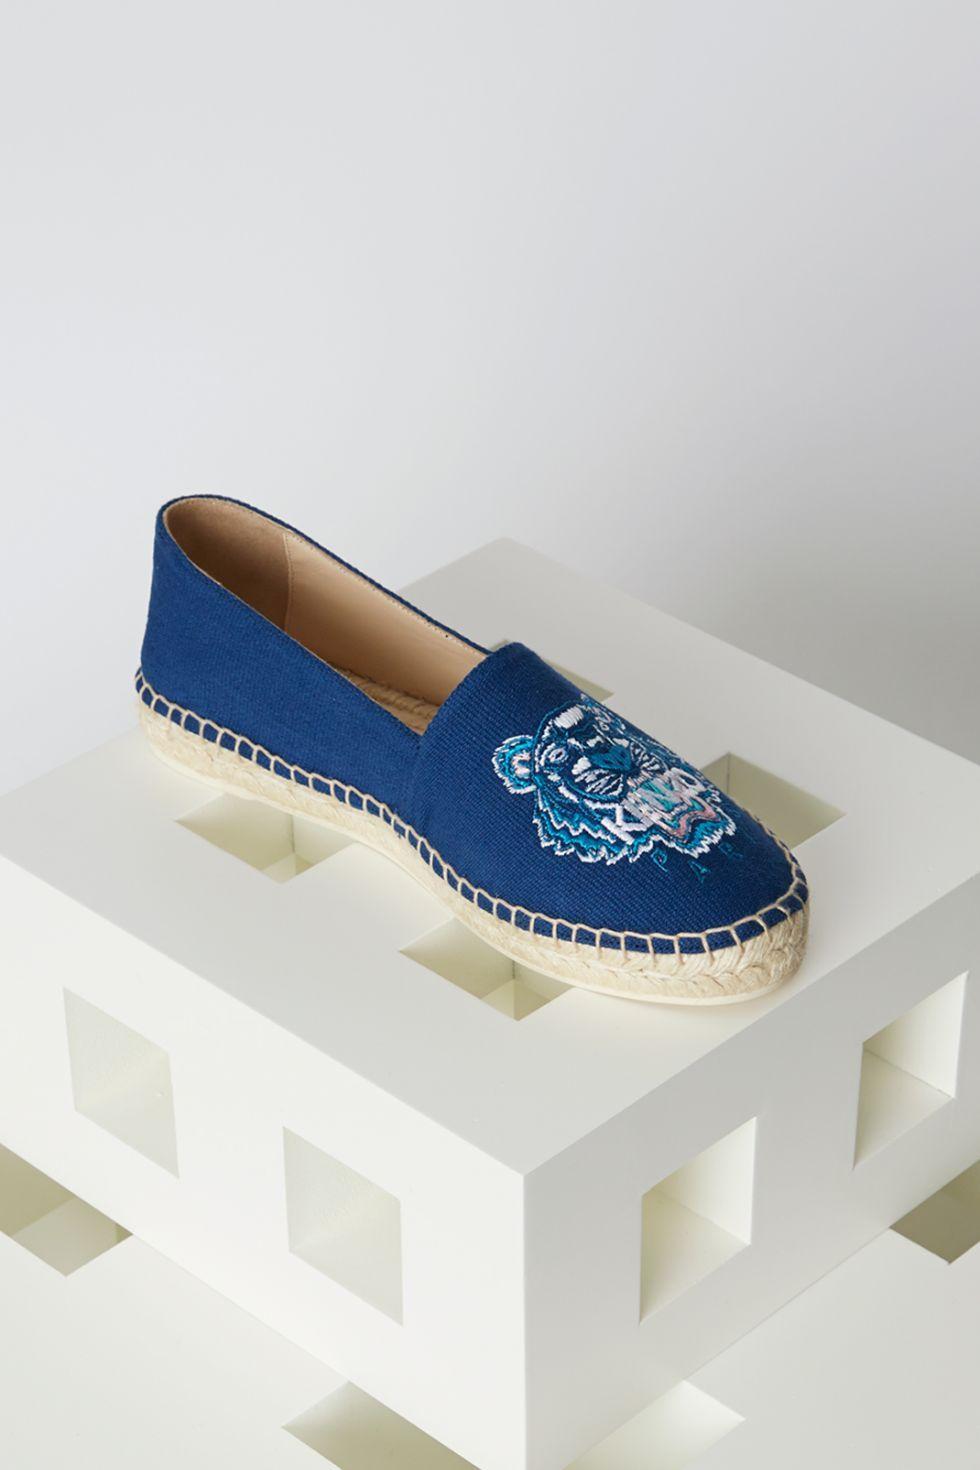 5596637b44 Kenzo Tiger Espadrilles - Kenzo Shoes Women - Kenzo E-shop | Things ...